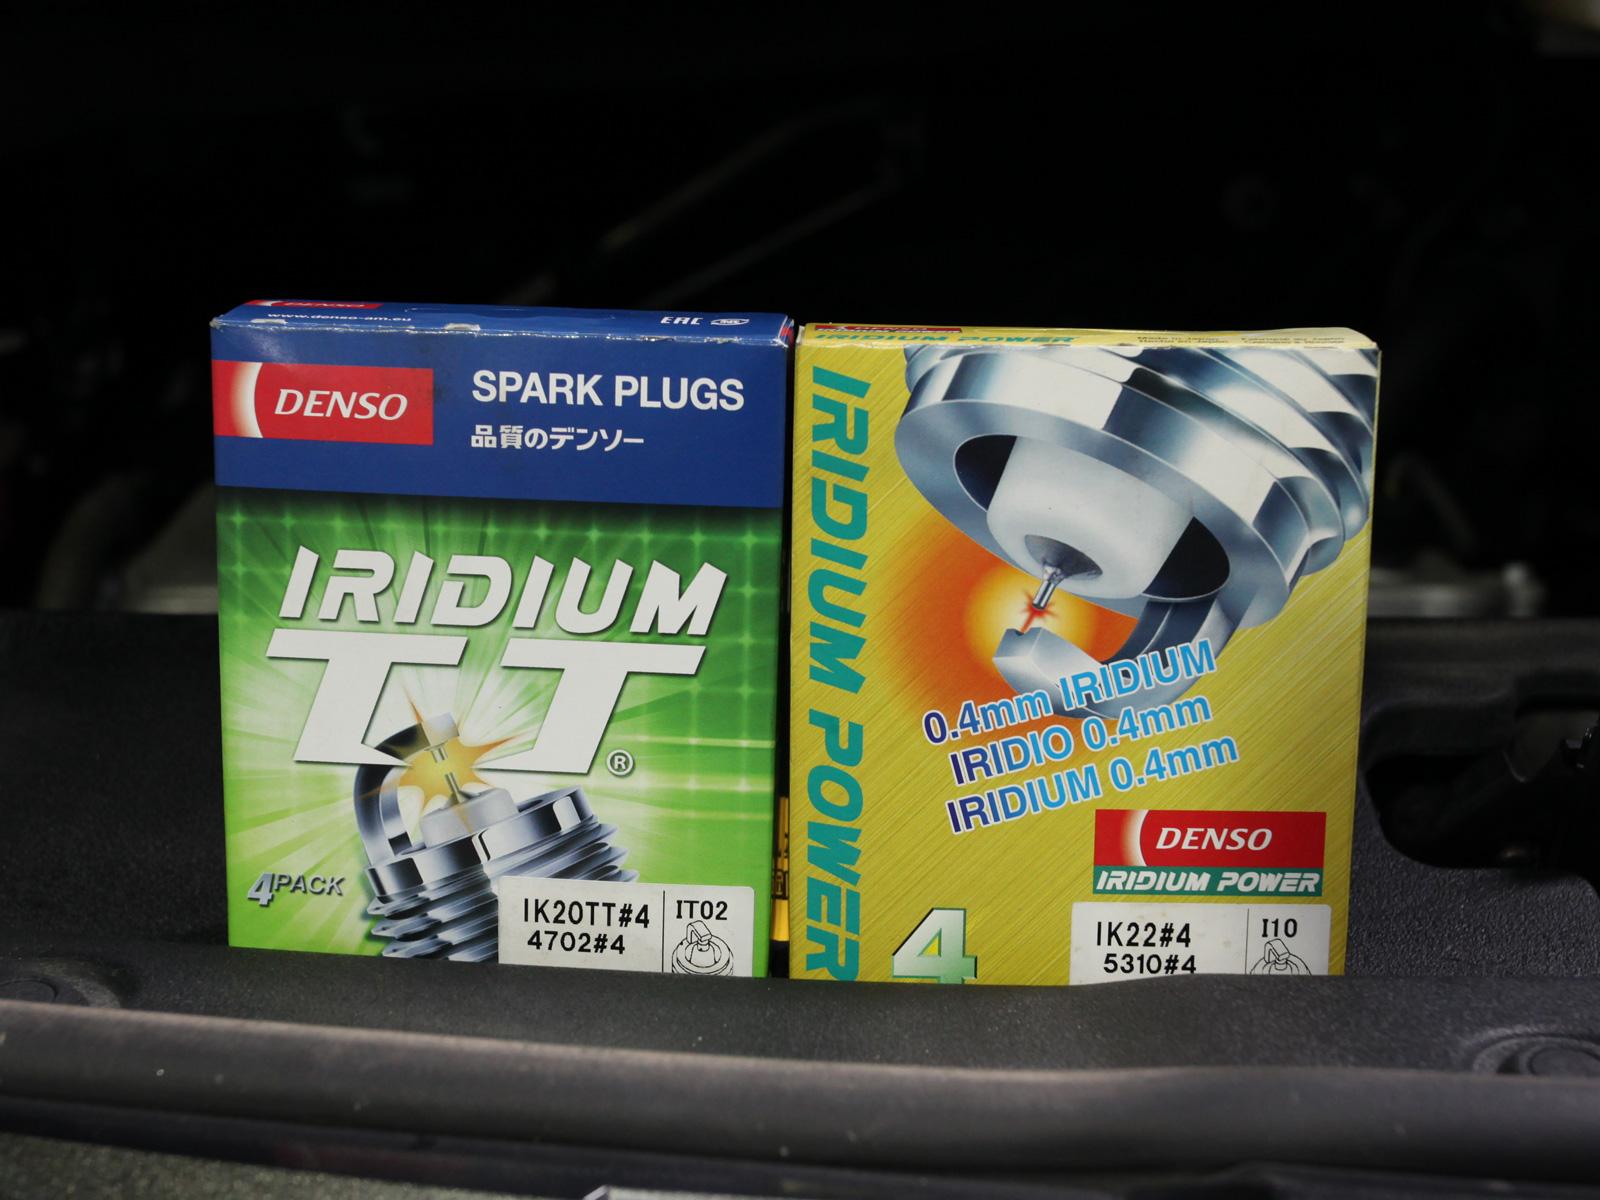 Denso Iridium Twin Tip Spark Plug (Japanese and Asian Car Makes Vehicle)